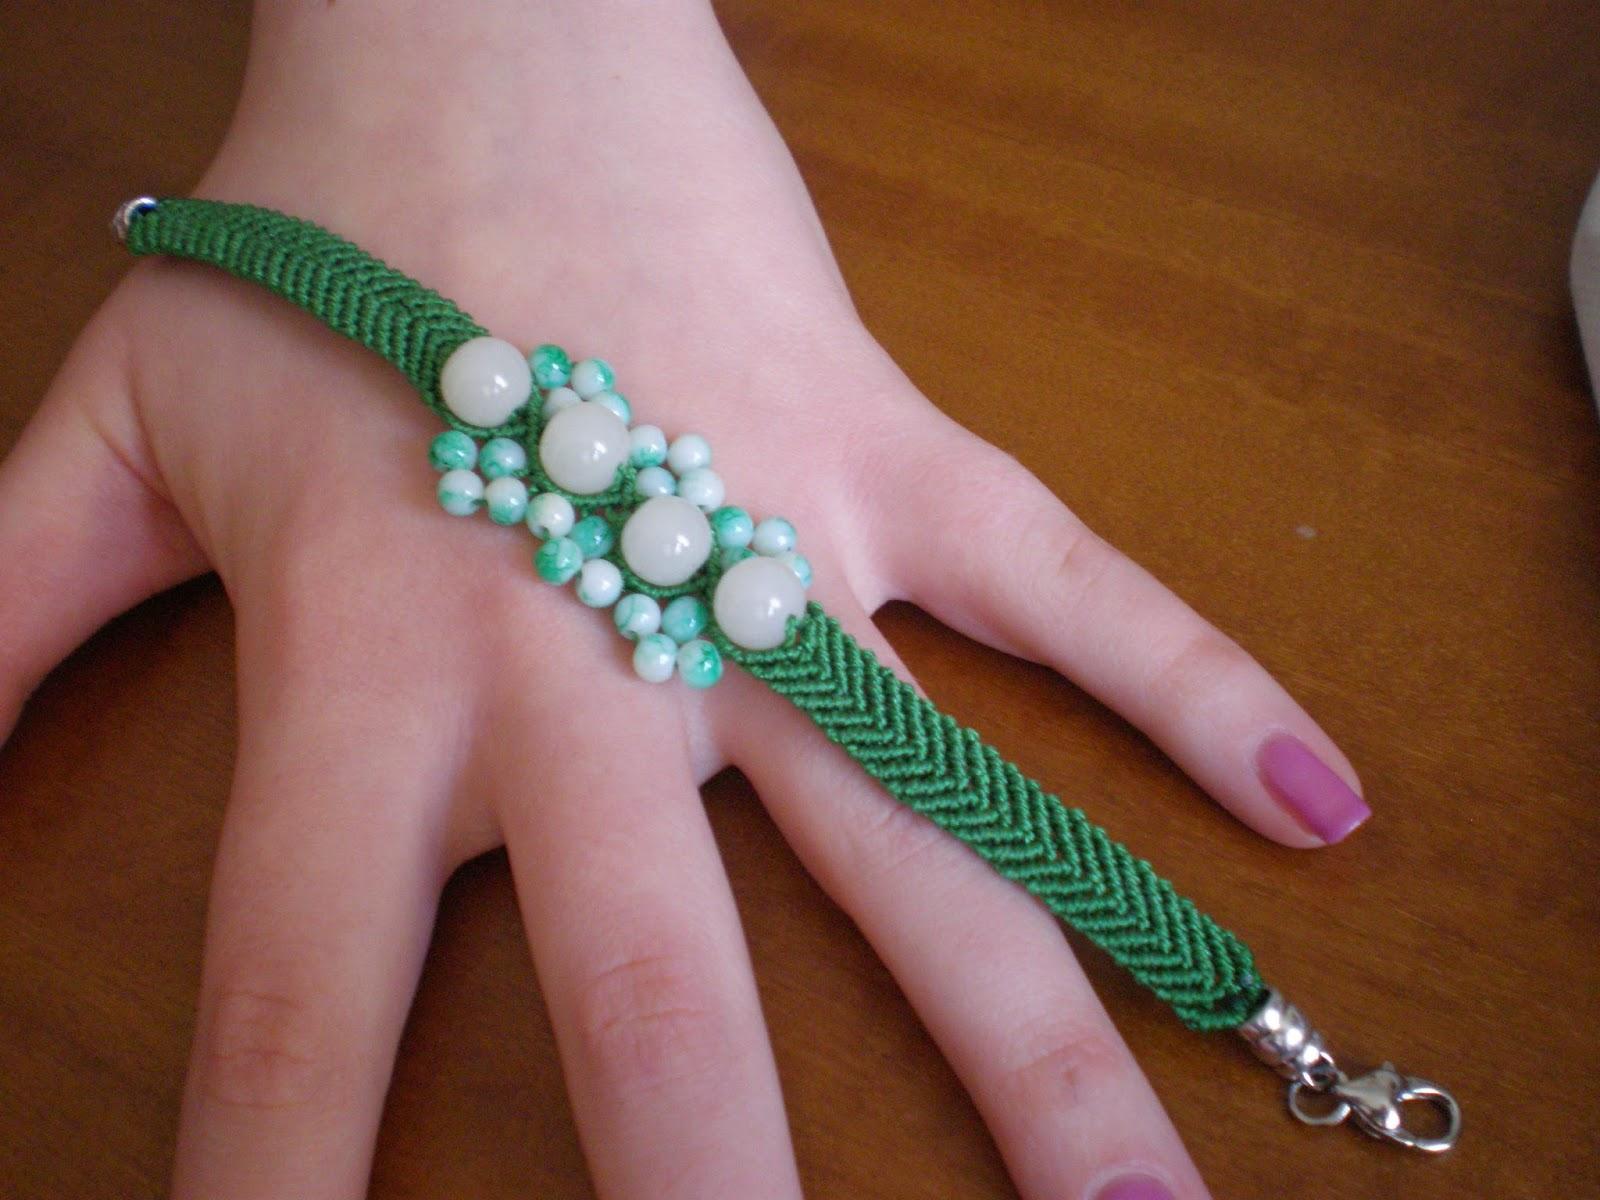 Favoloso Le Perline di ElisaLisetta: febbraio 2015 DL63